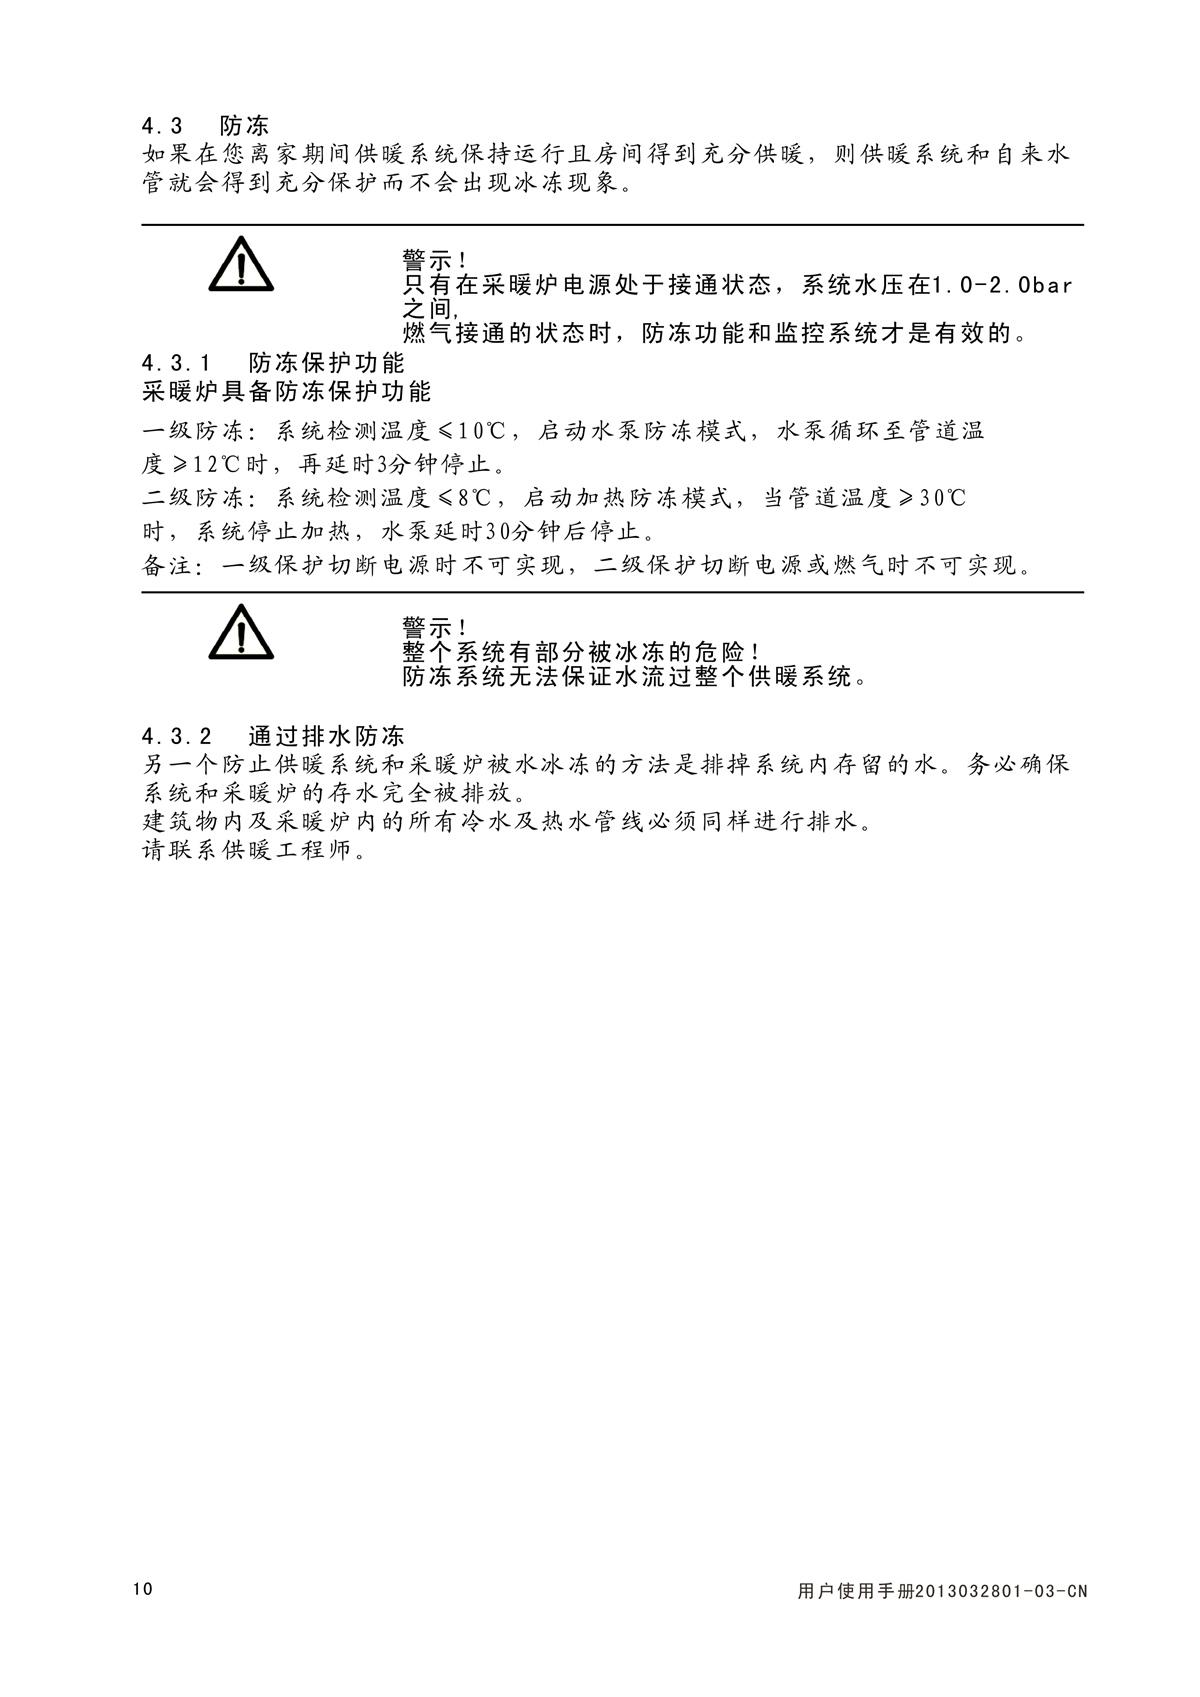 ES16A系列-用户使用手册-8_01.jpg